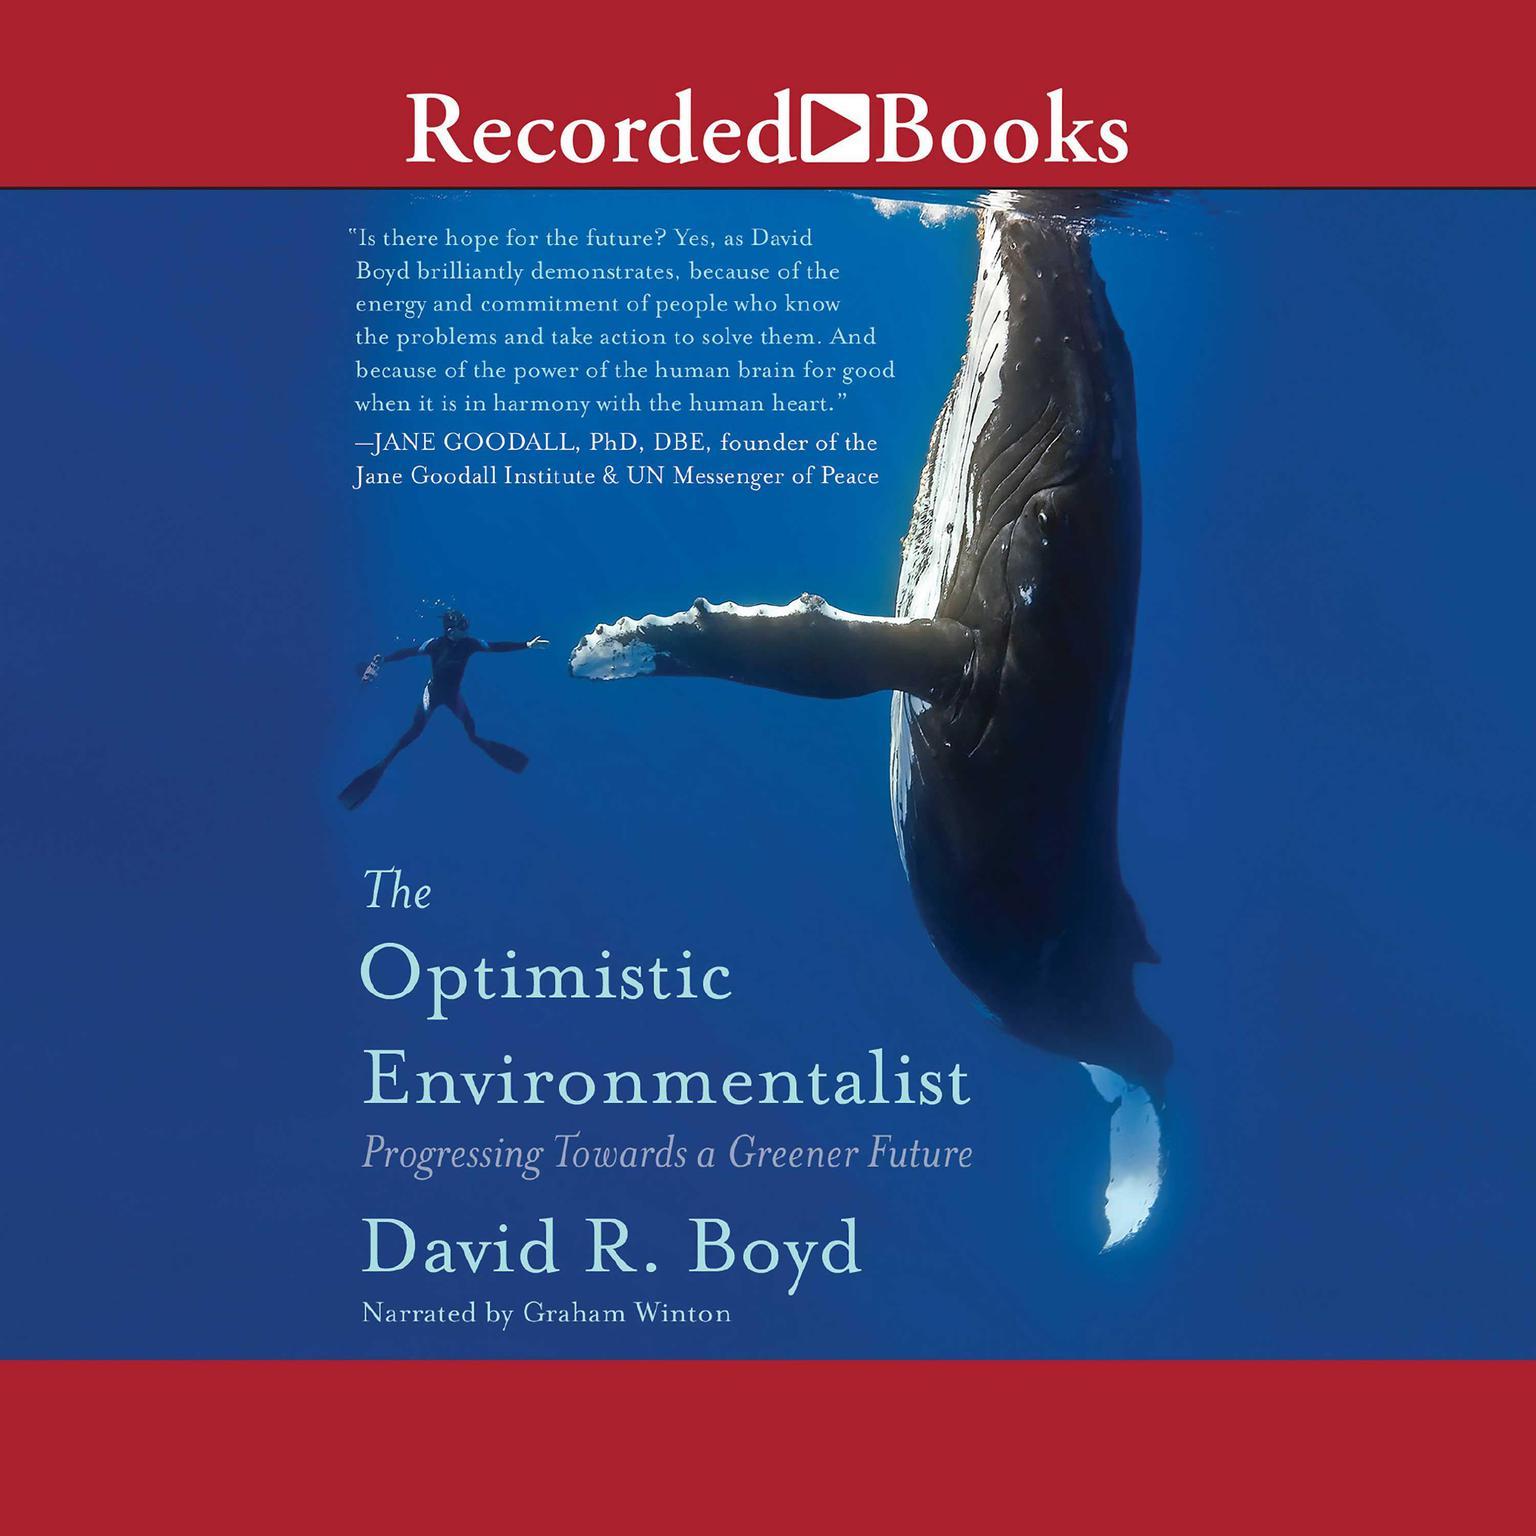 The Optimistic Environmentalist Audiobook Listen Instantly